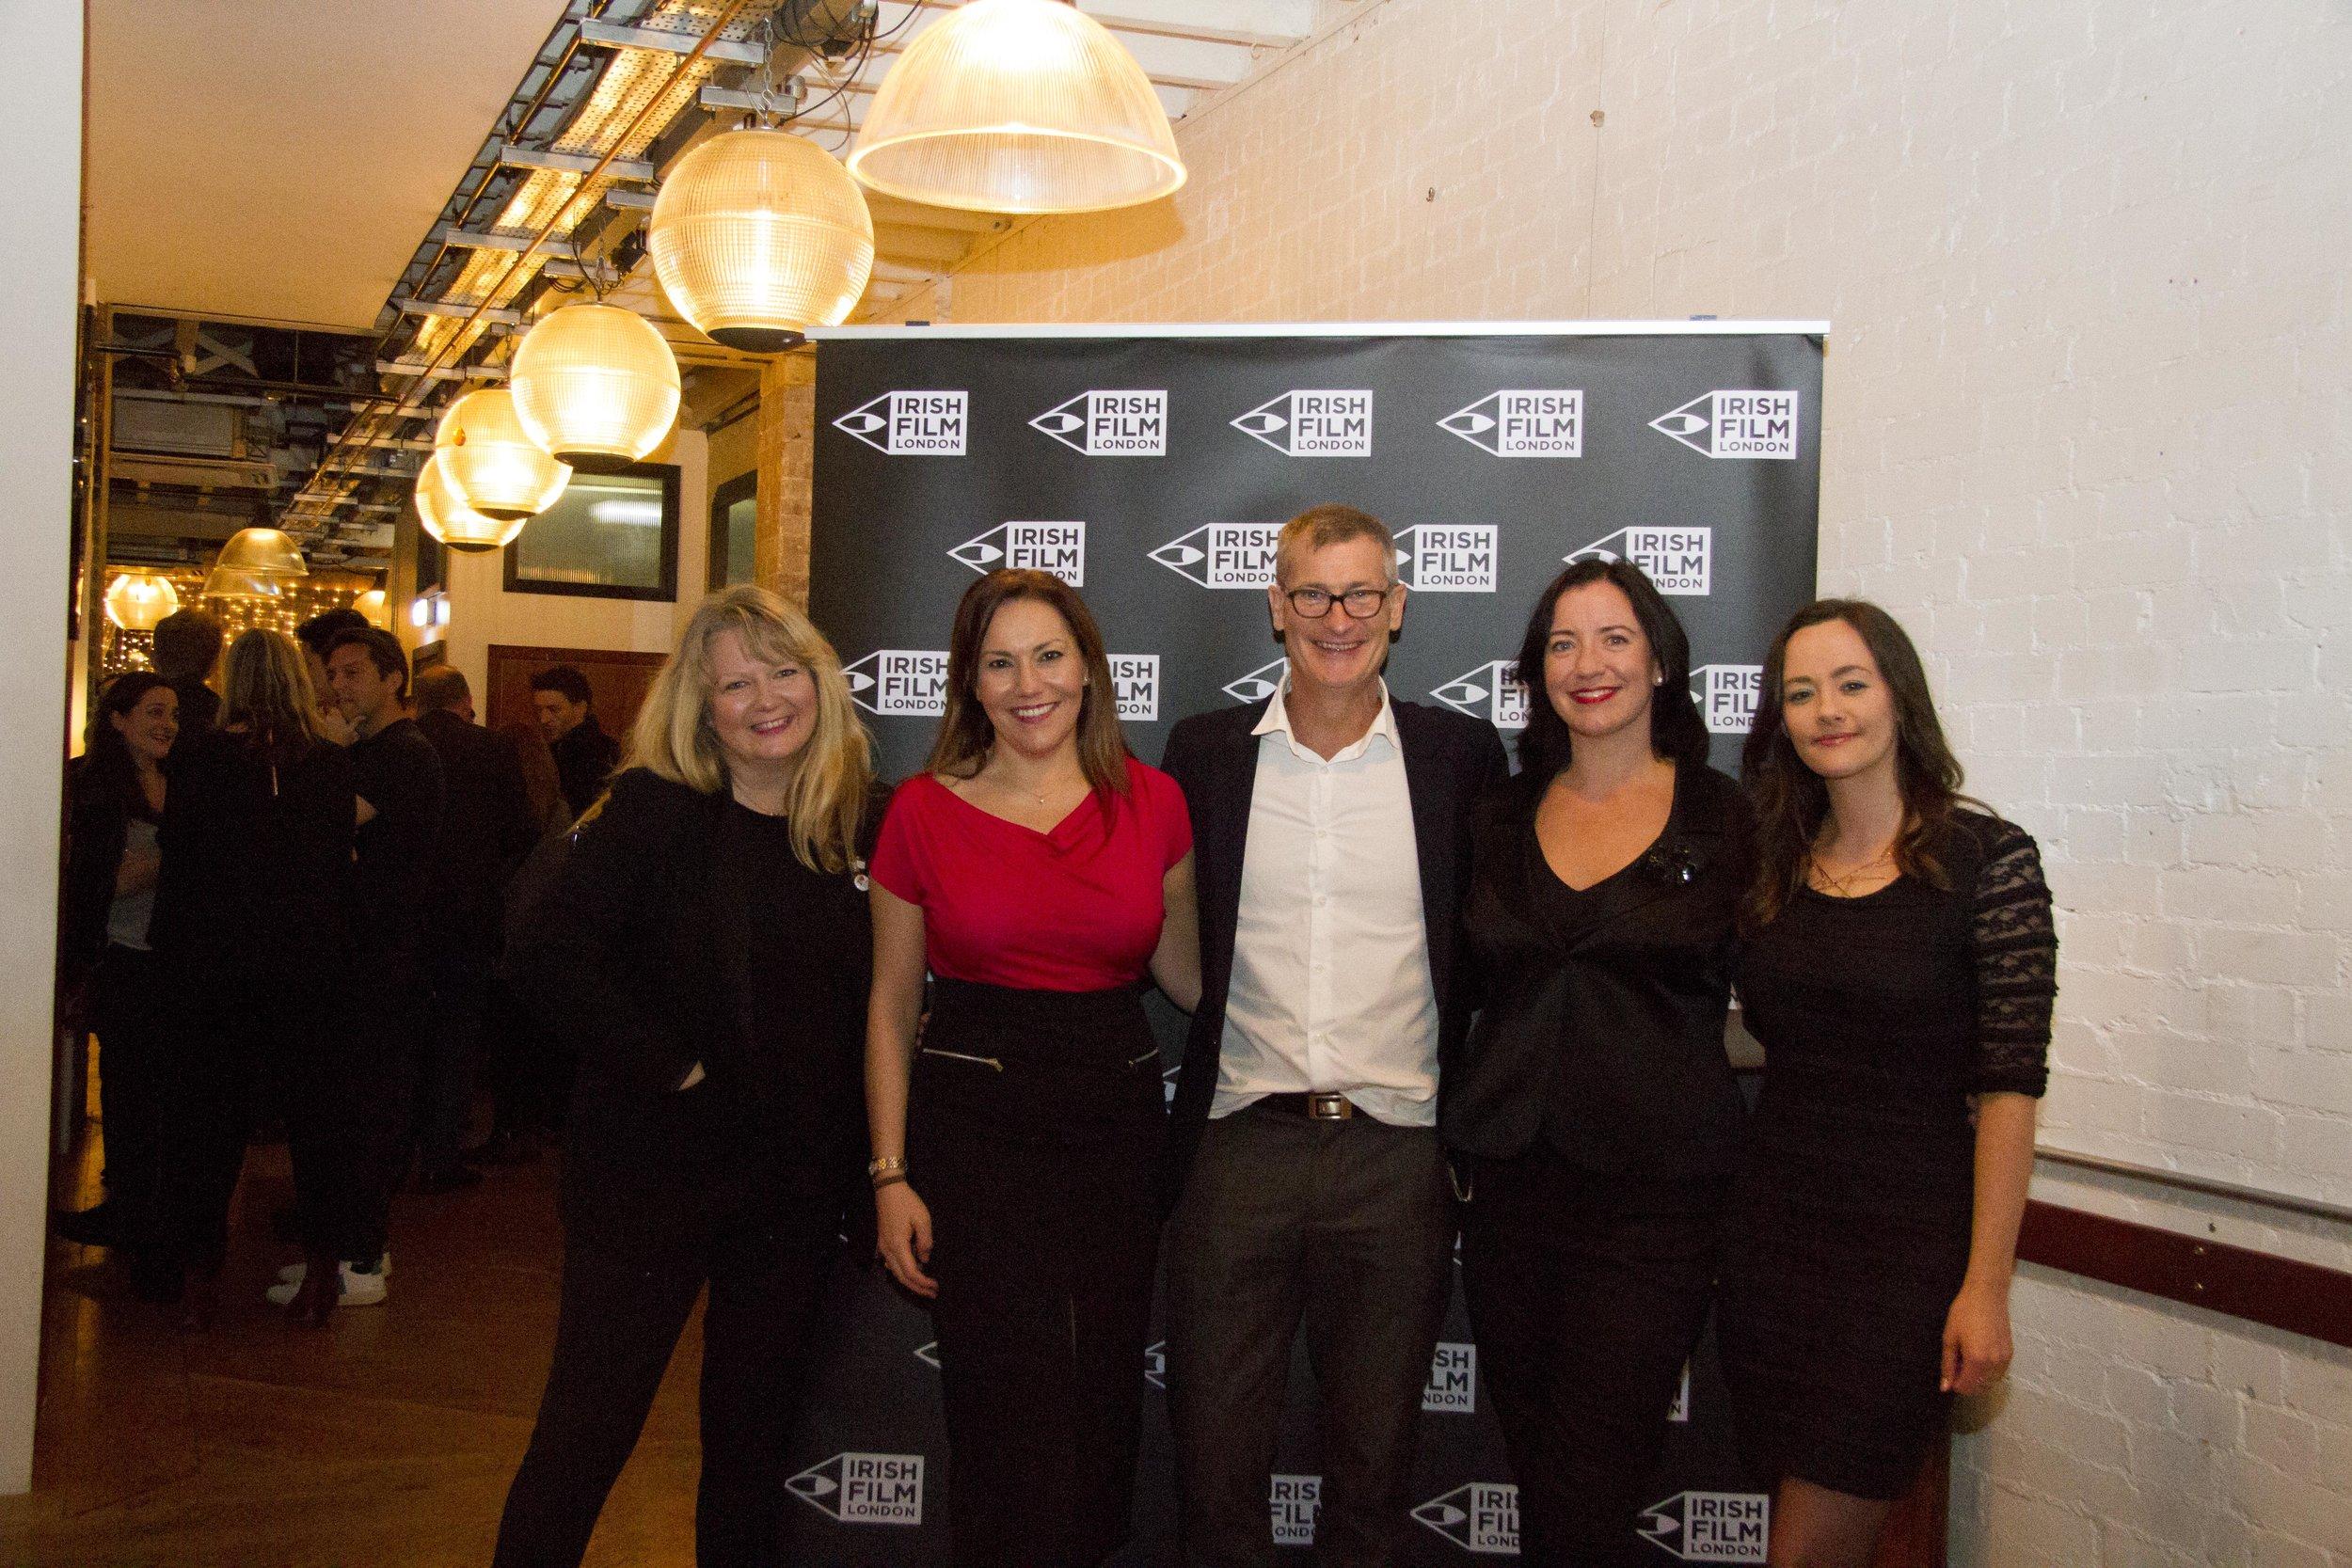 Black 47 London Premiere 2018 Photos courtesy of Noel Mullen Irish Film London 68 Irish Film London team.jpg